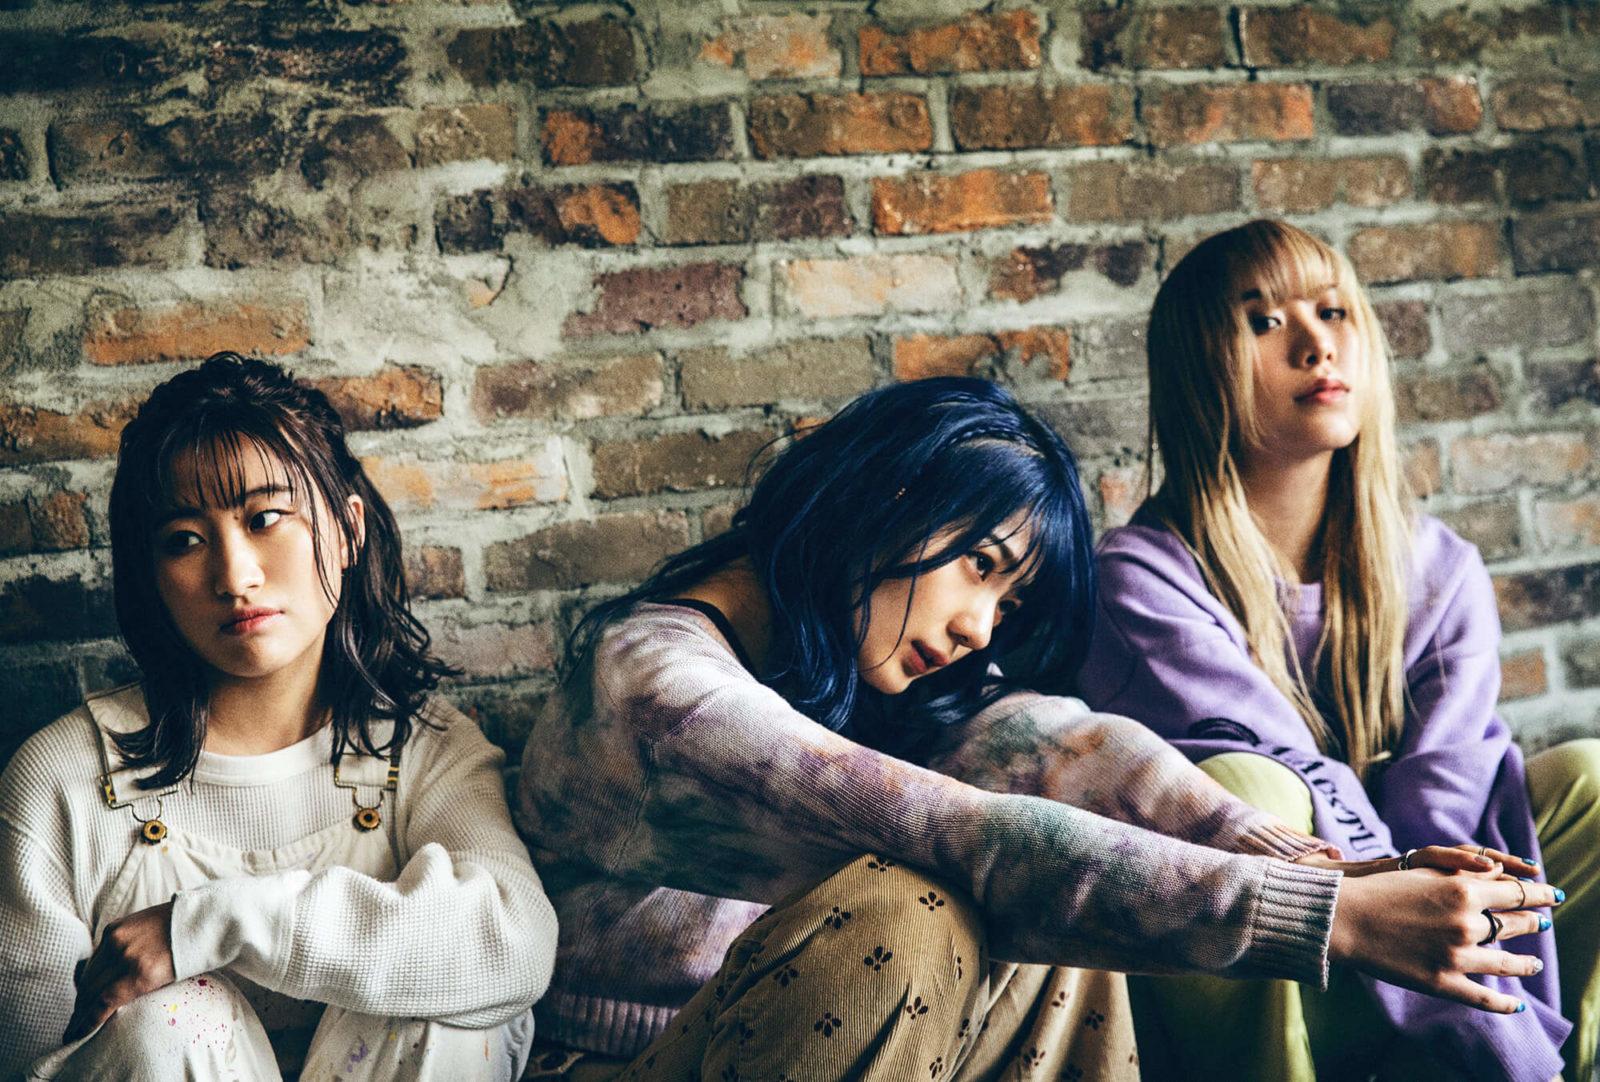 the peggies、11ヶ月ぶりCD「アネモネEP」発売決定サムネイル画像